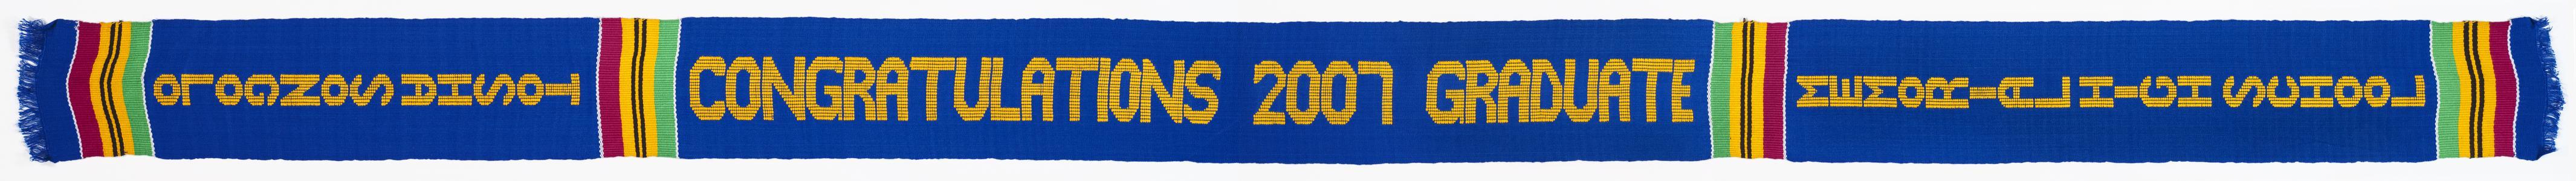 Congratulations 2007 Graduate